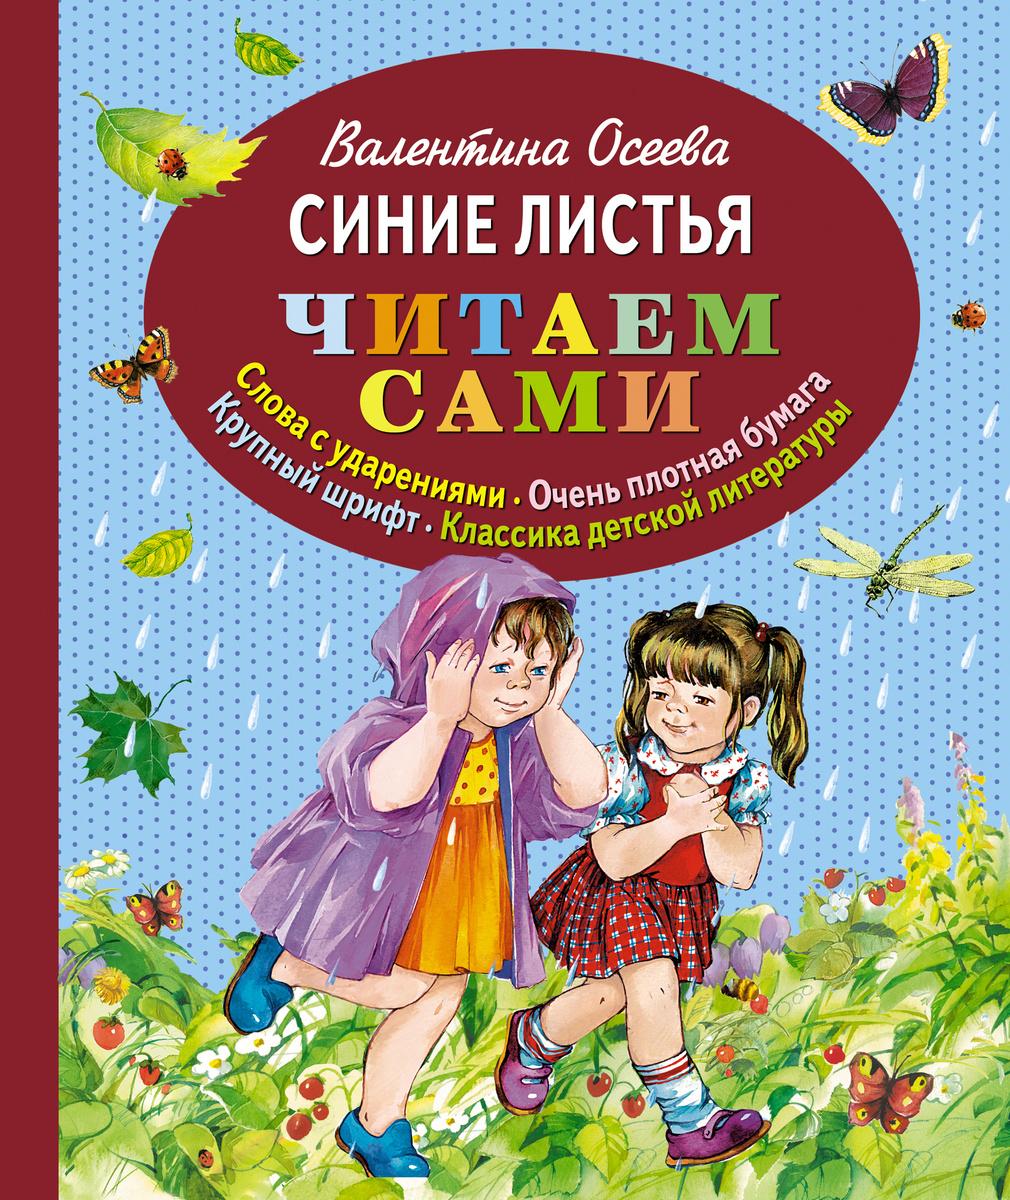 (2013)Синие листья (ст. изд.) | Осеева Валентина Александровна  #1